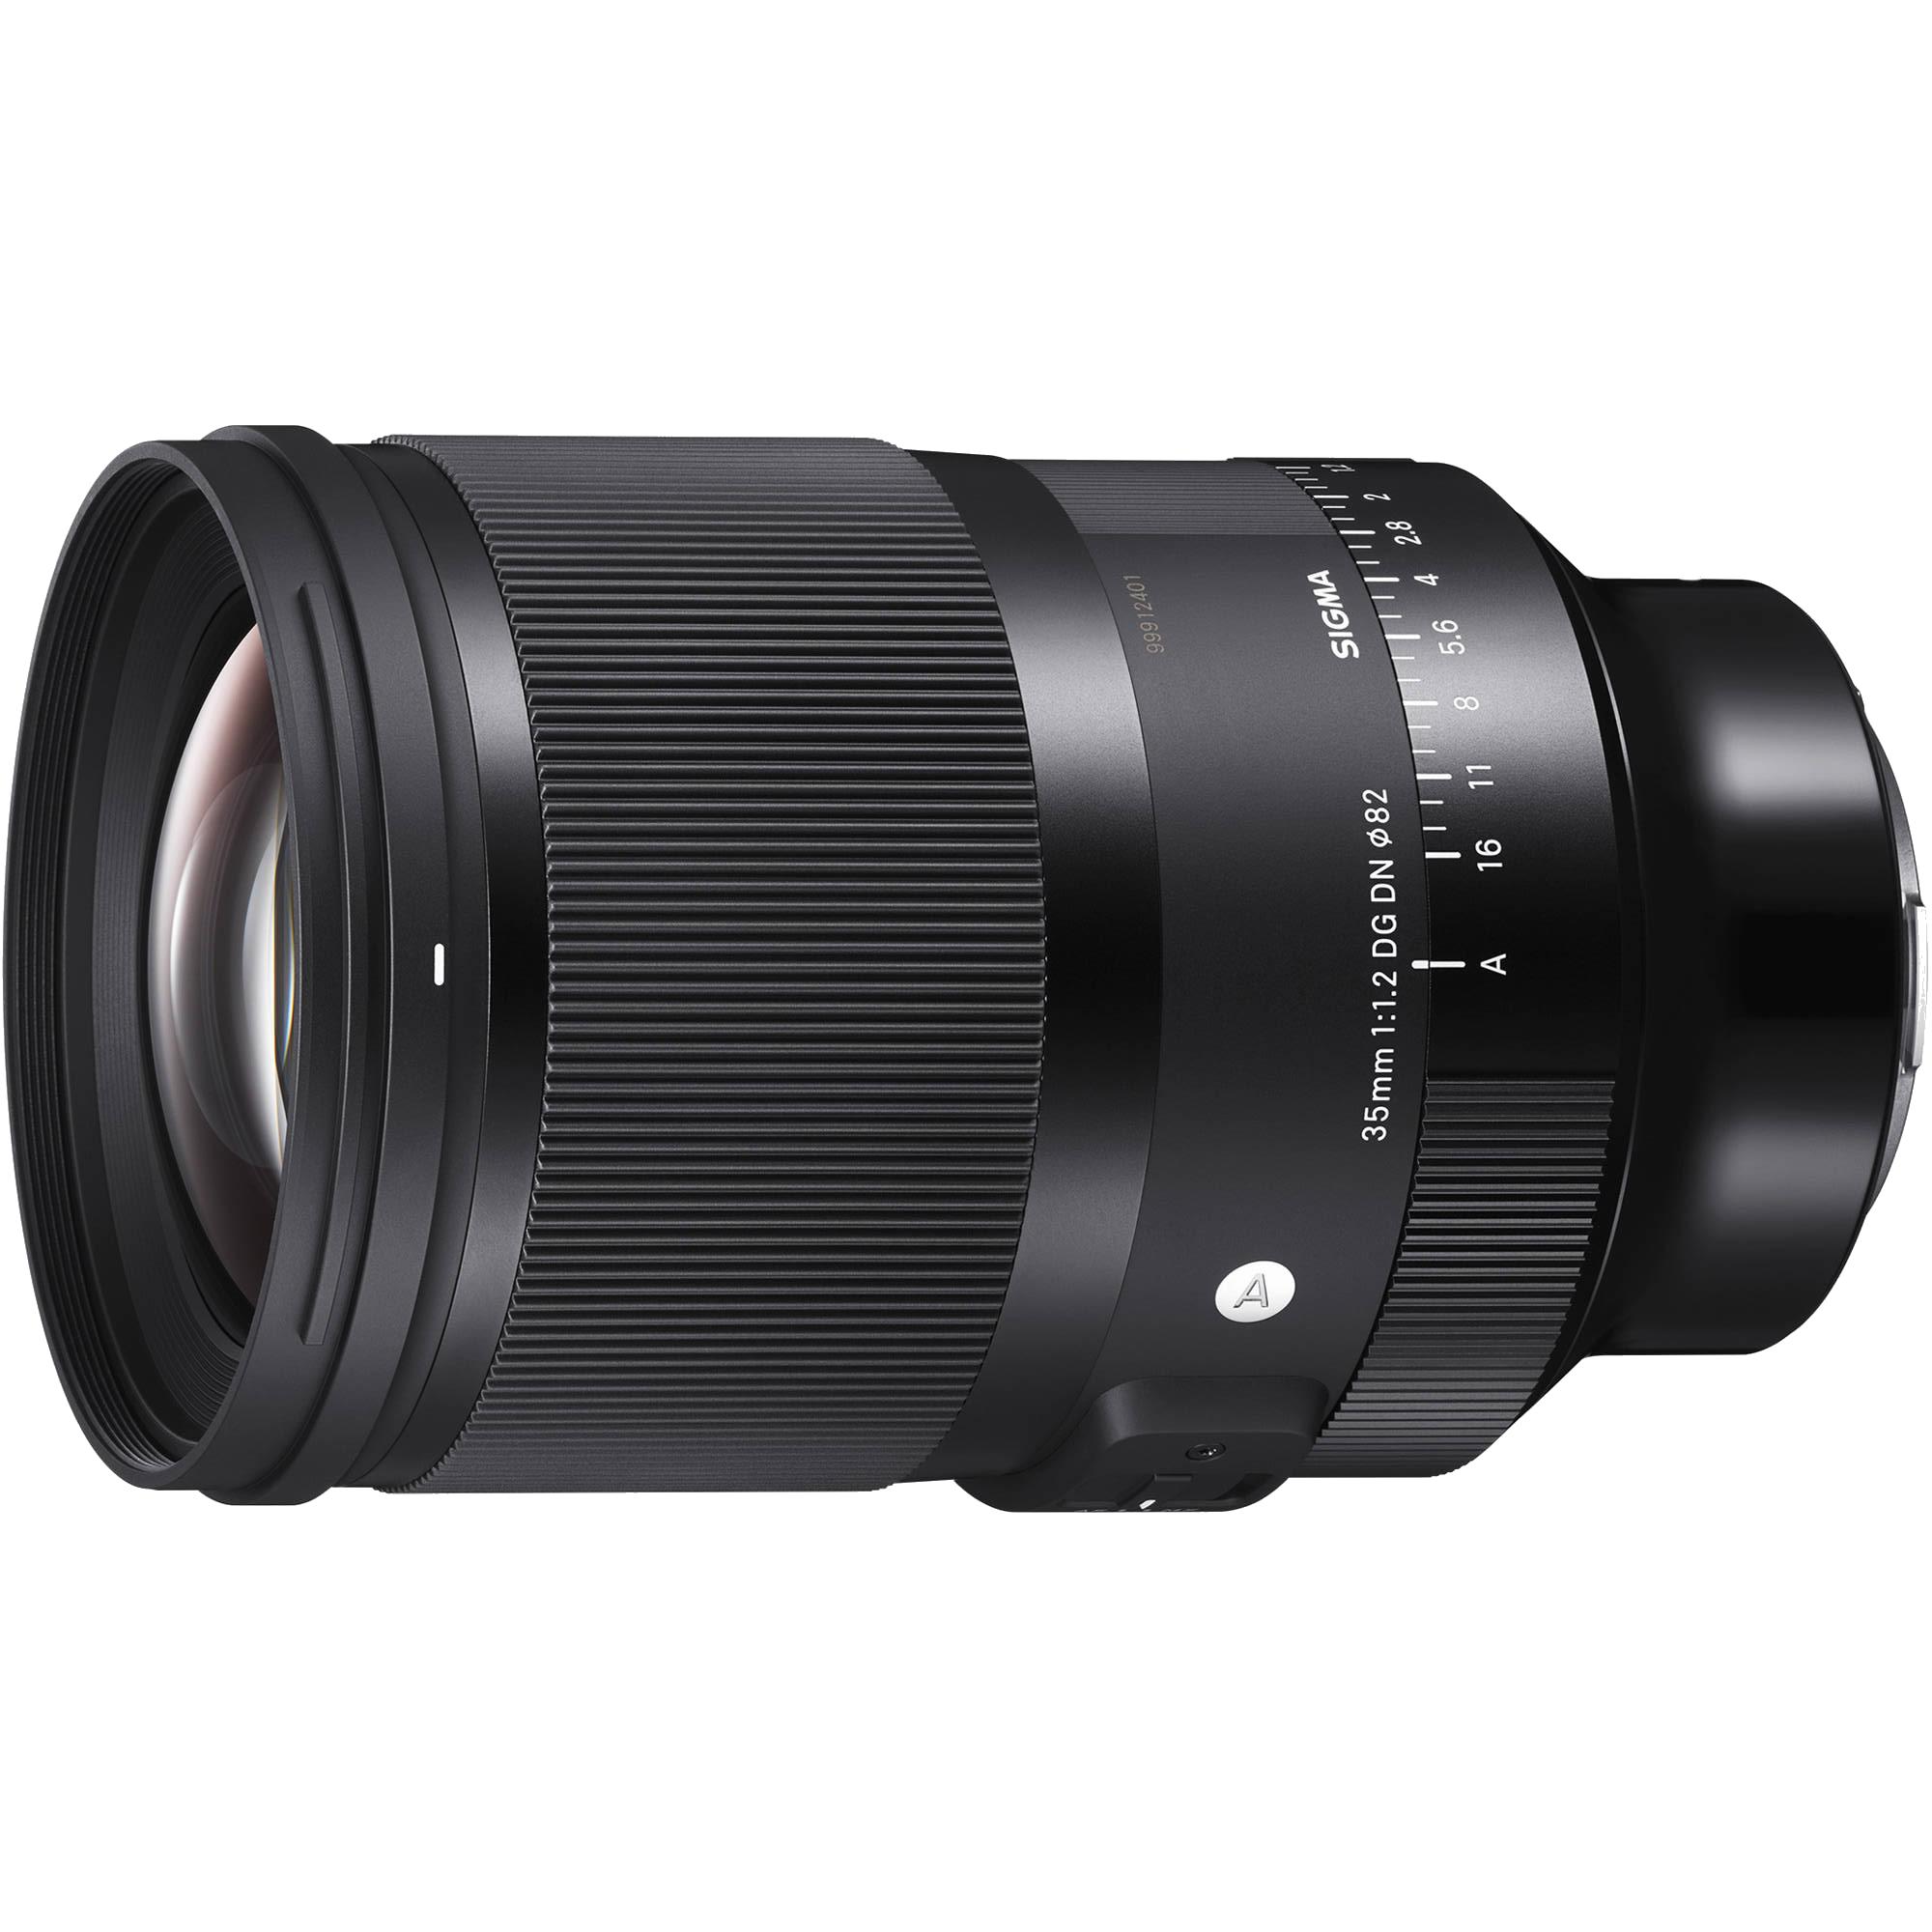 Sigma 35mm f/1.2 DG DN Art